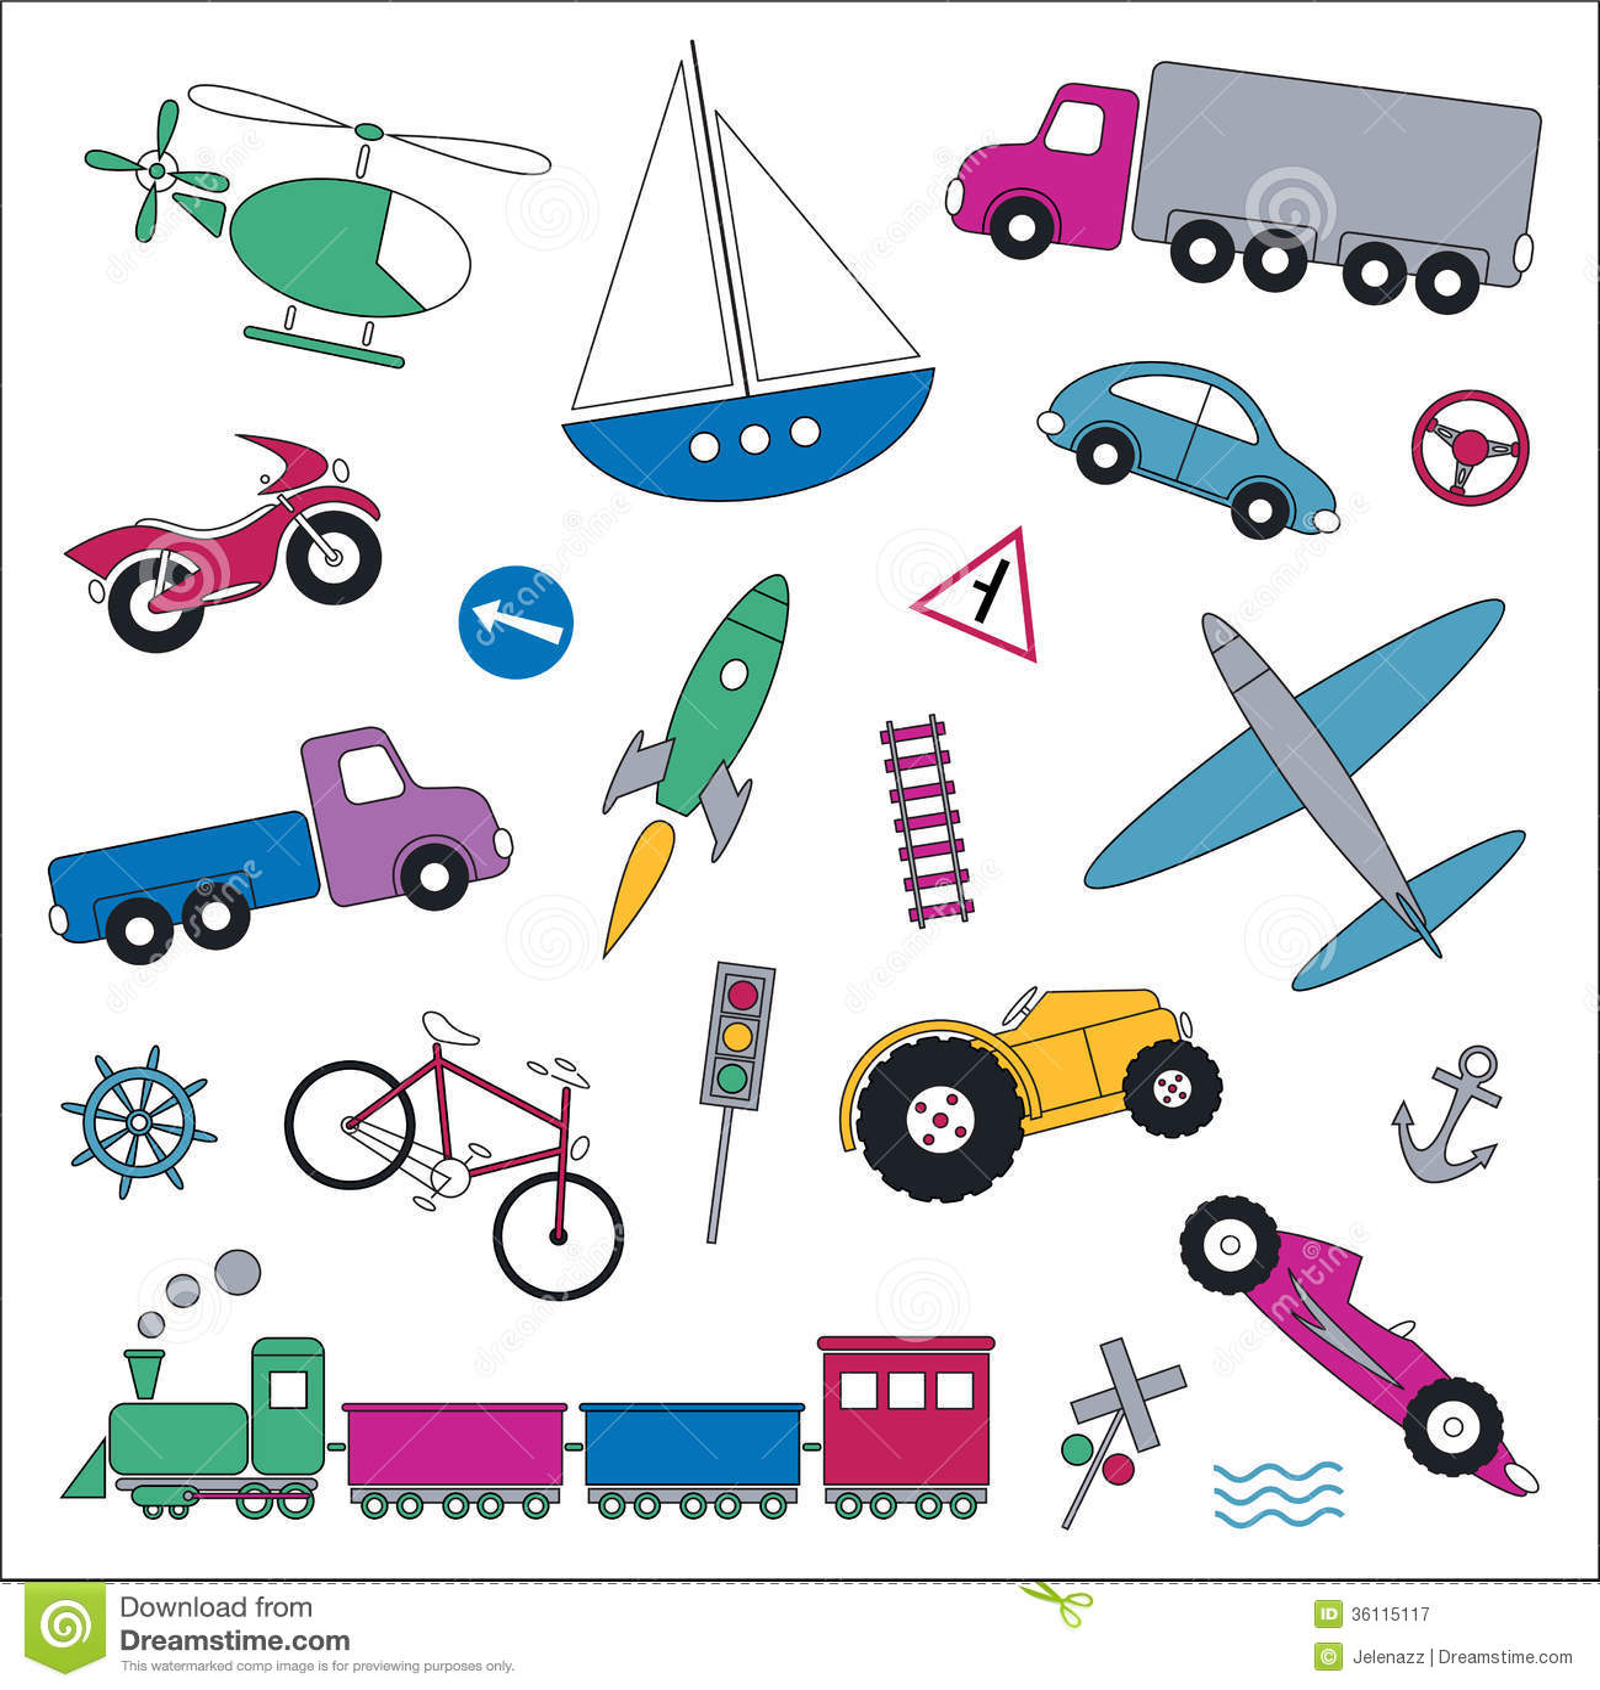 Transportation Vehicles Collection Illustration Royalty ...